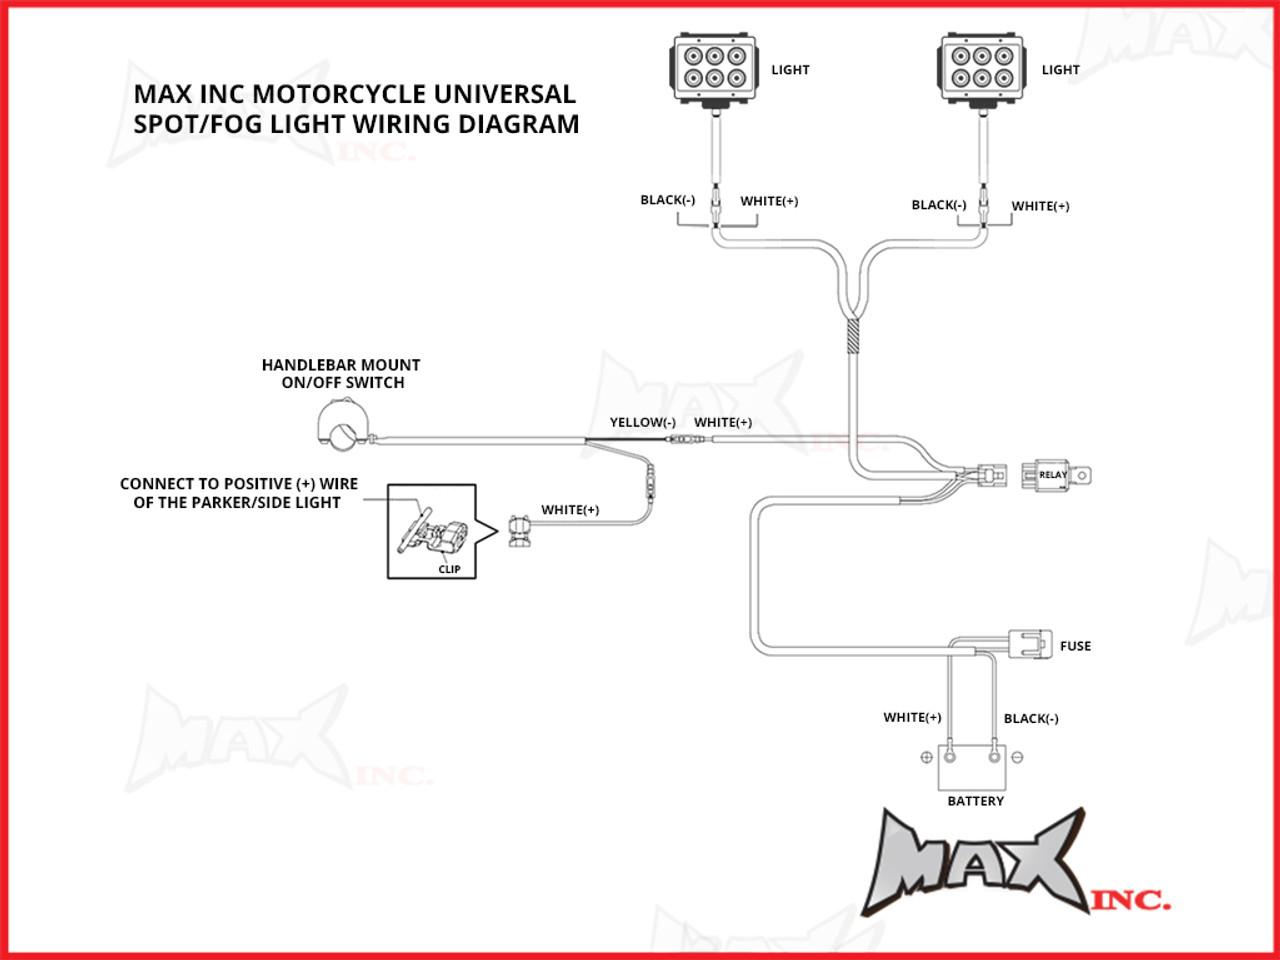 accessory spotlight wiring diagram for motorcycle wiring library rh 2 akszer eu rigid driving light wiring [ 1024 x 768 Pixel ]